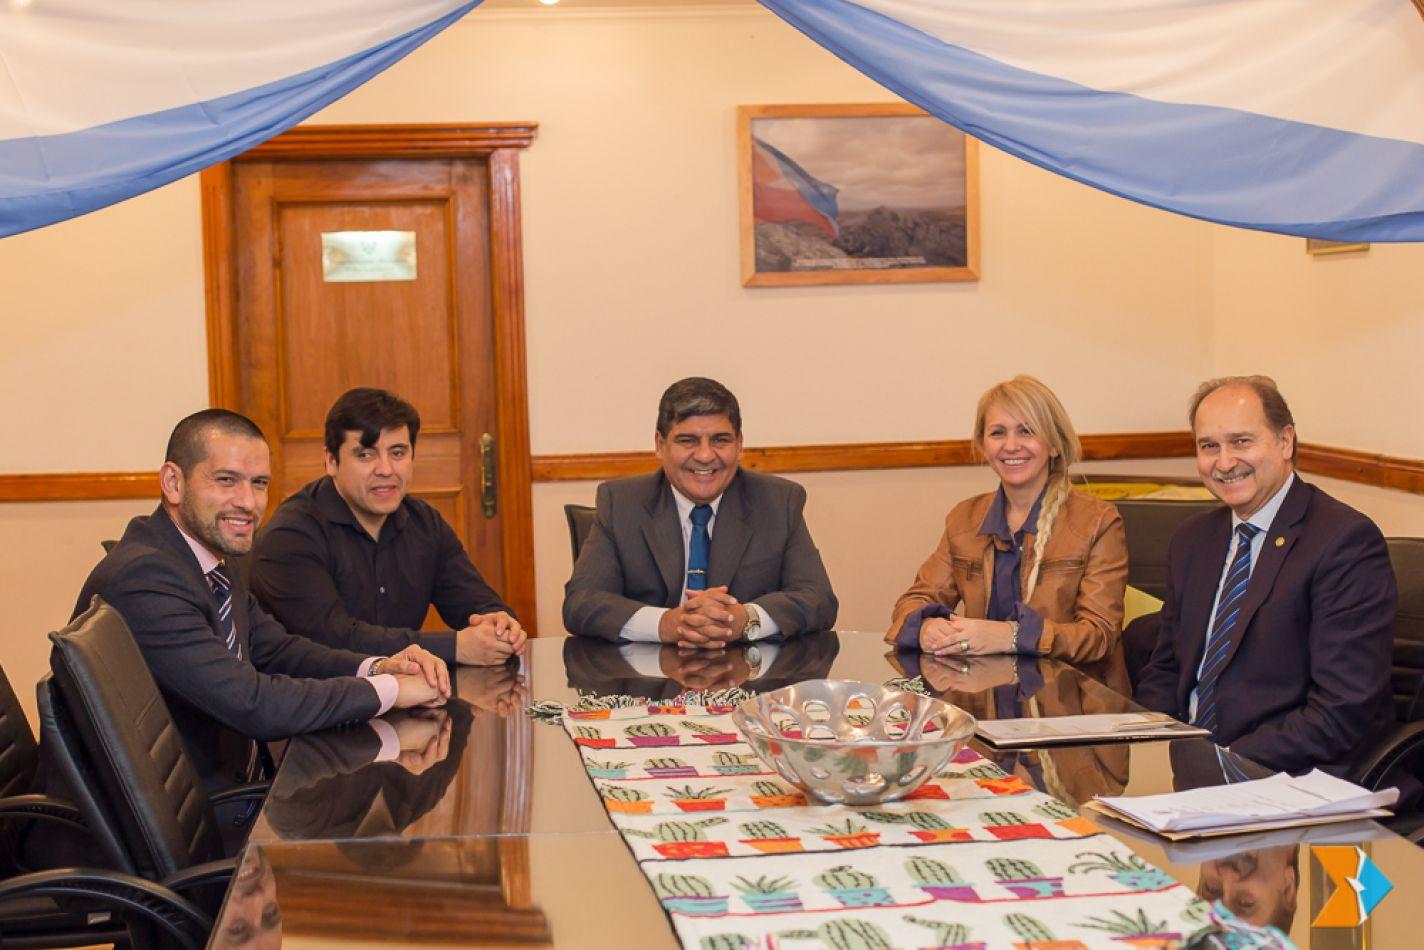 Reunión con integrantes de diferentes instituciones de Ushuaia